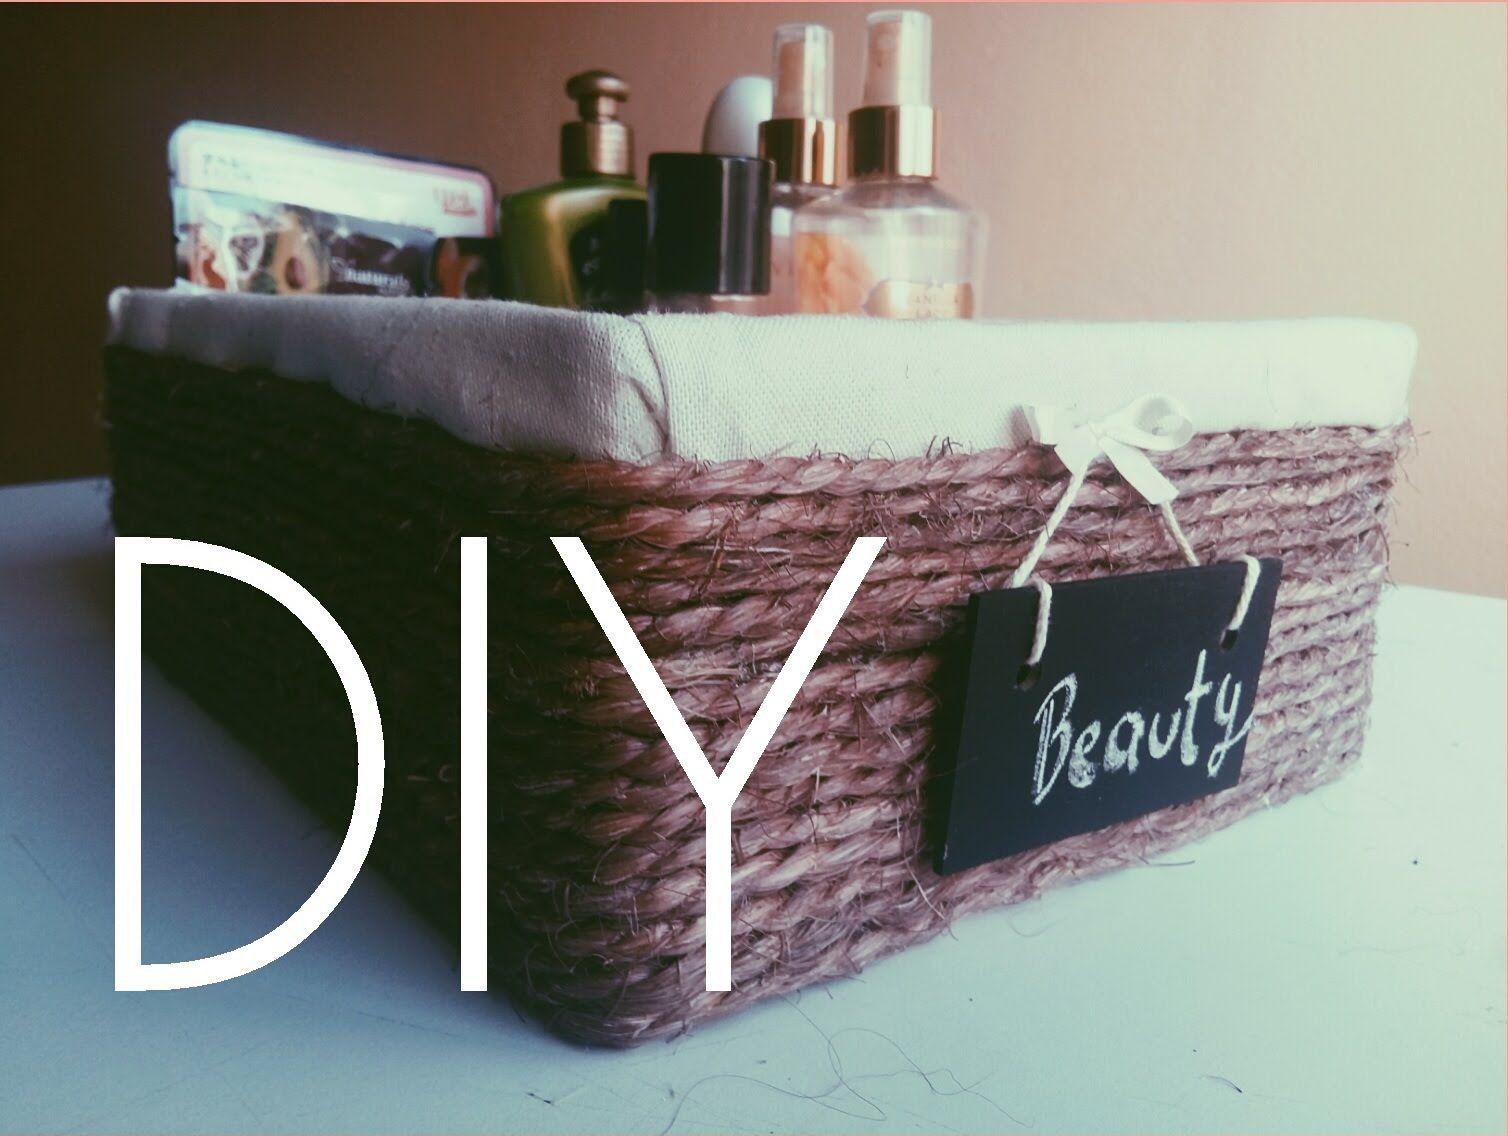 Diy cesta canasta con caja de zapatos ideas creativas - Manualidades con cajas ...